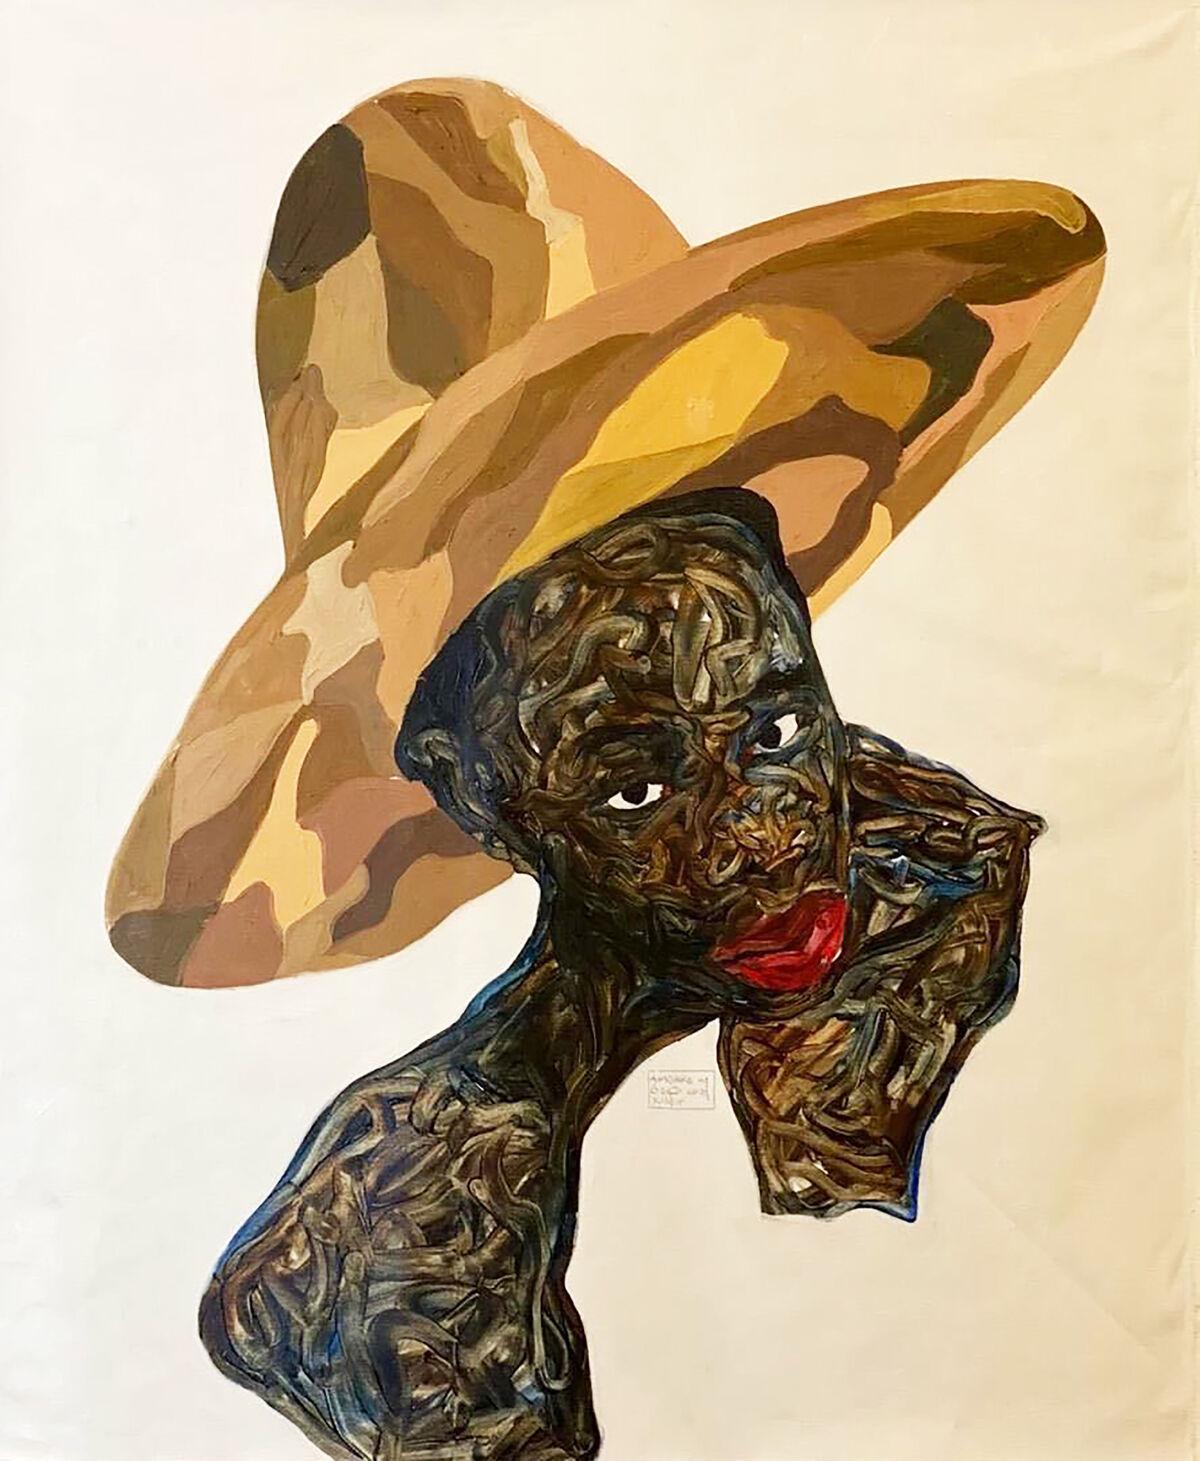 Amoako Boafo, Camouflage Hat, 2020. Courtesy of the artist and Mariane Ibrahim.